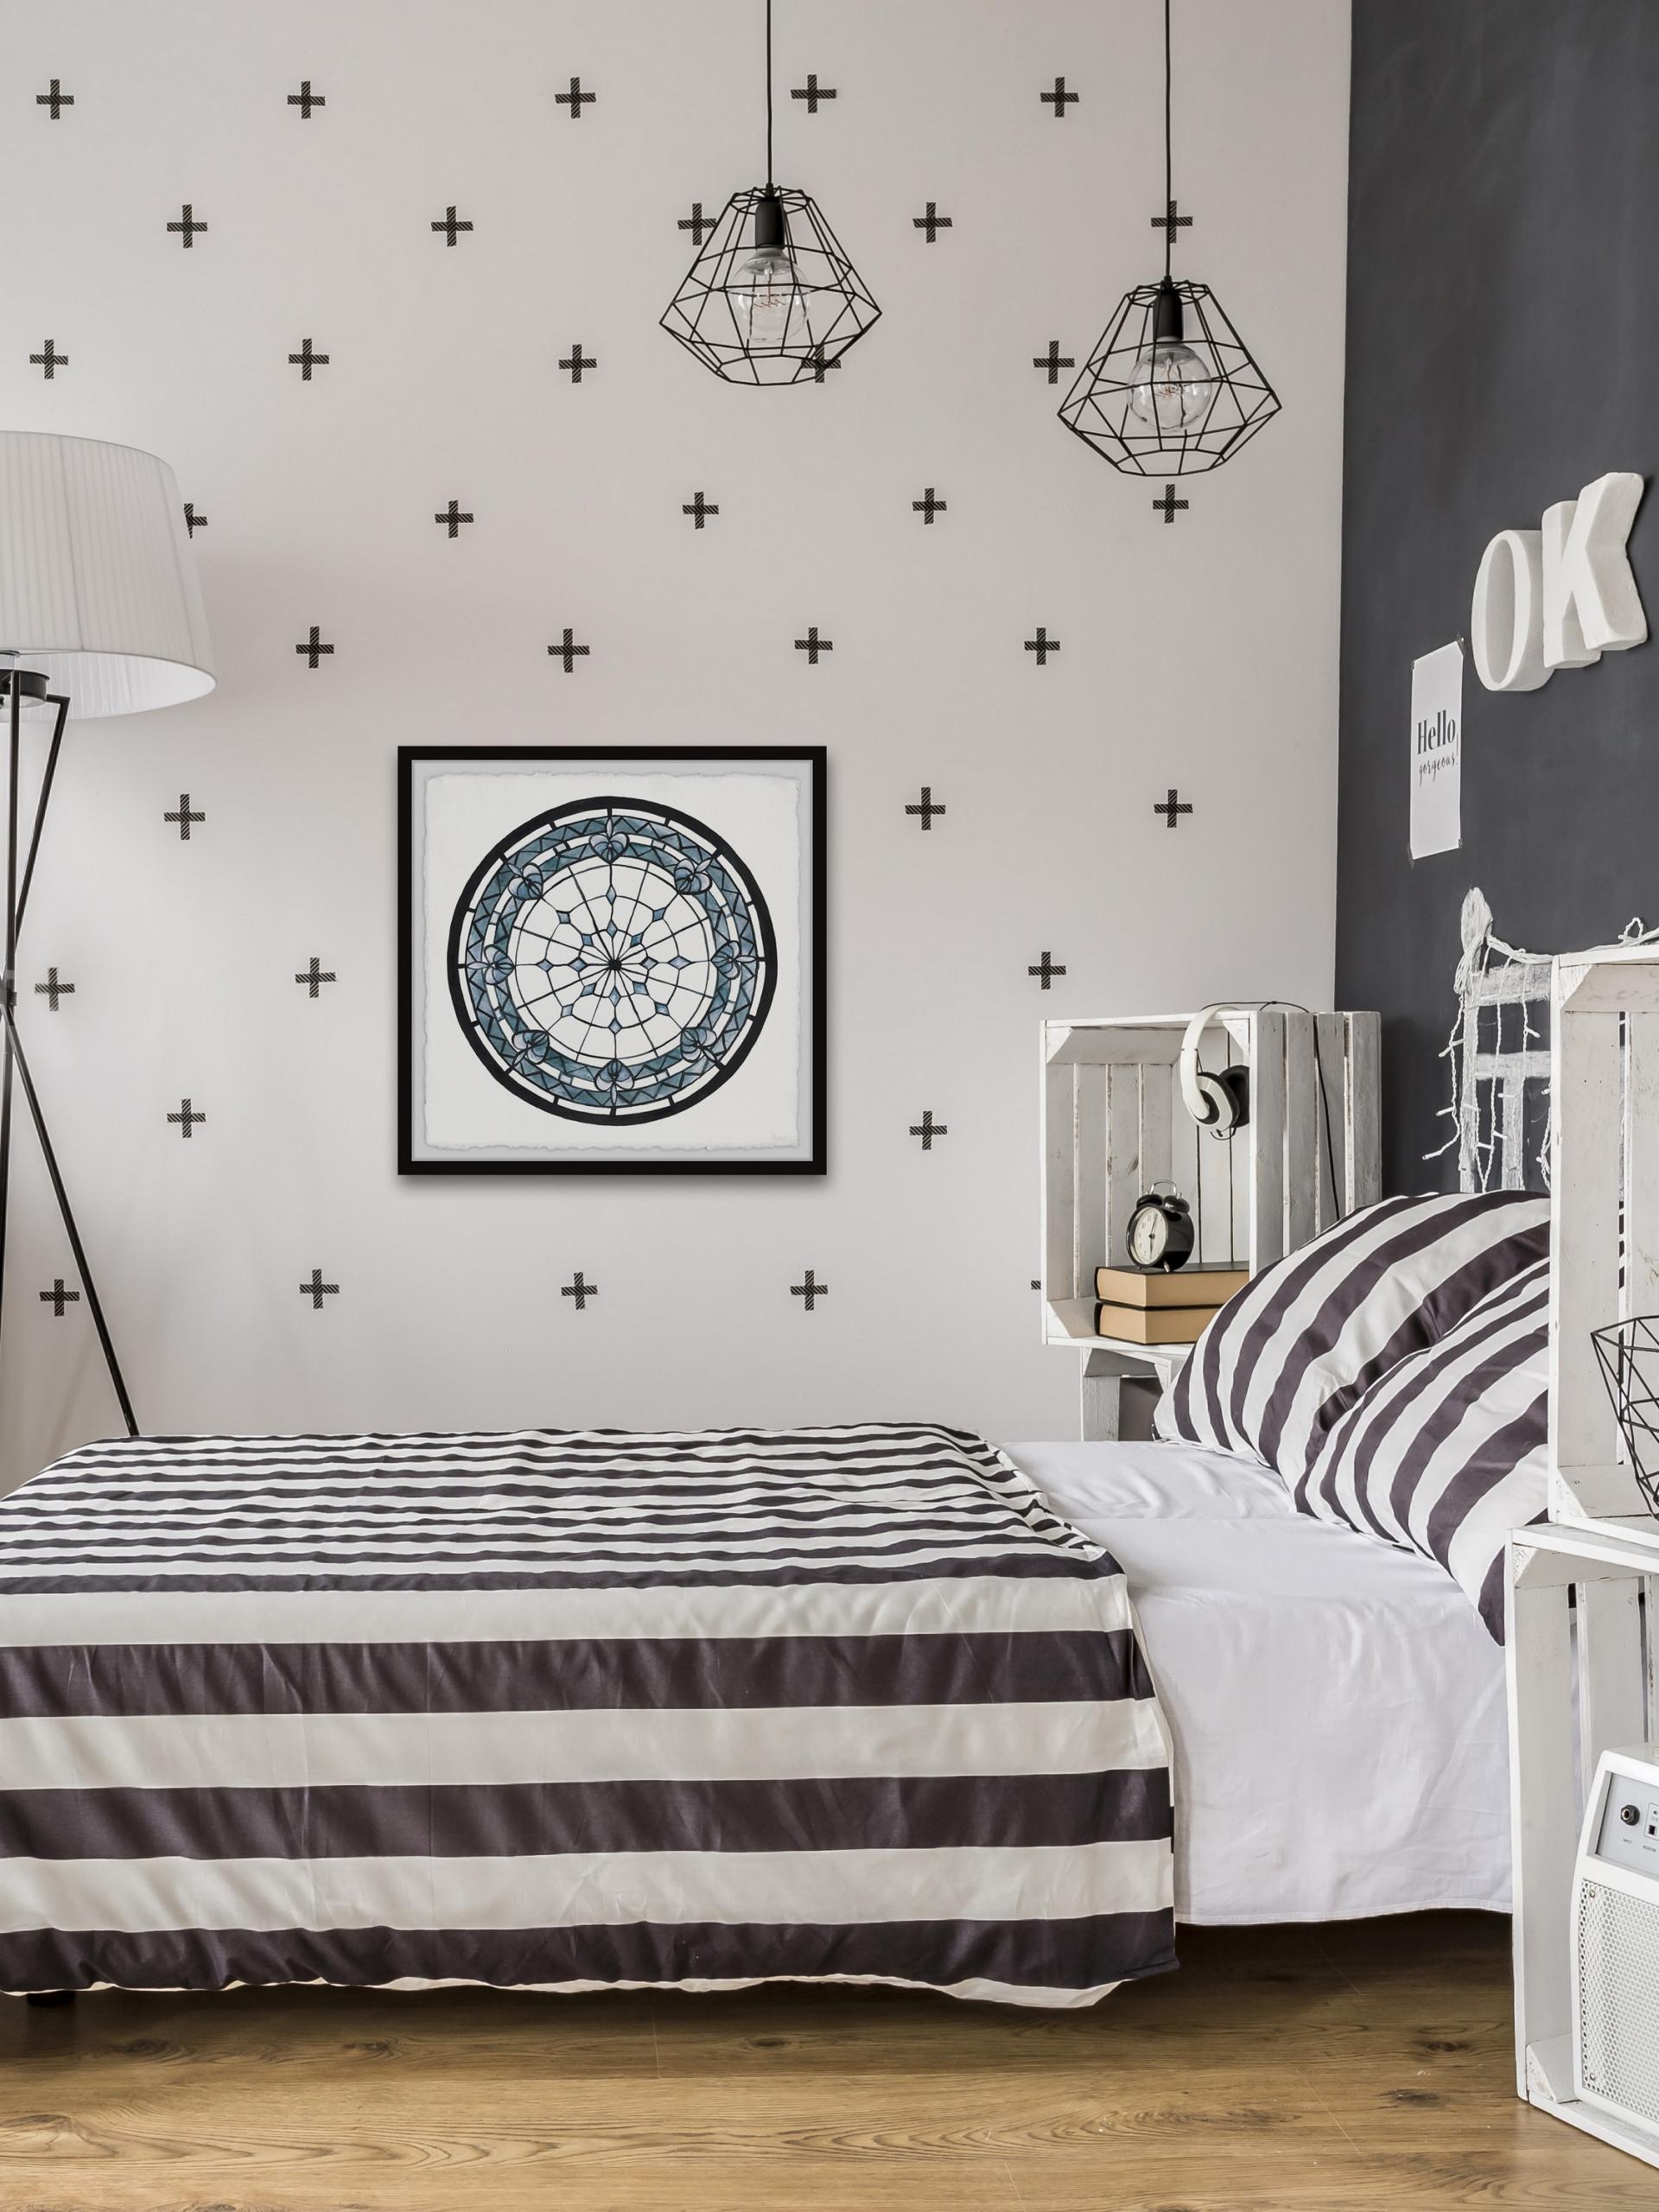 Dreamcatcher Bedroom Ideas And Photos Houzz